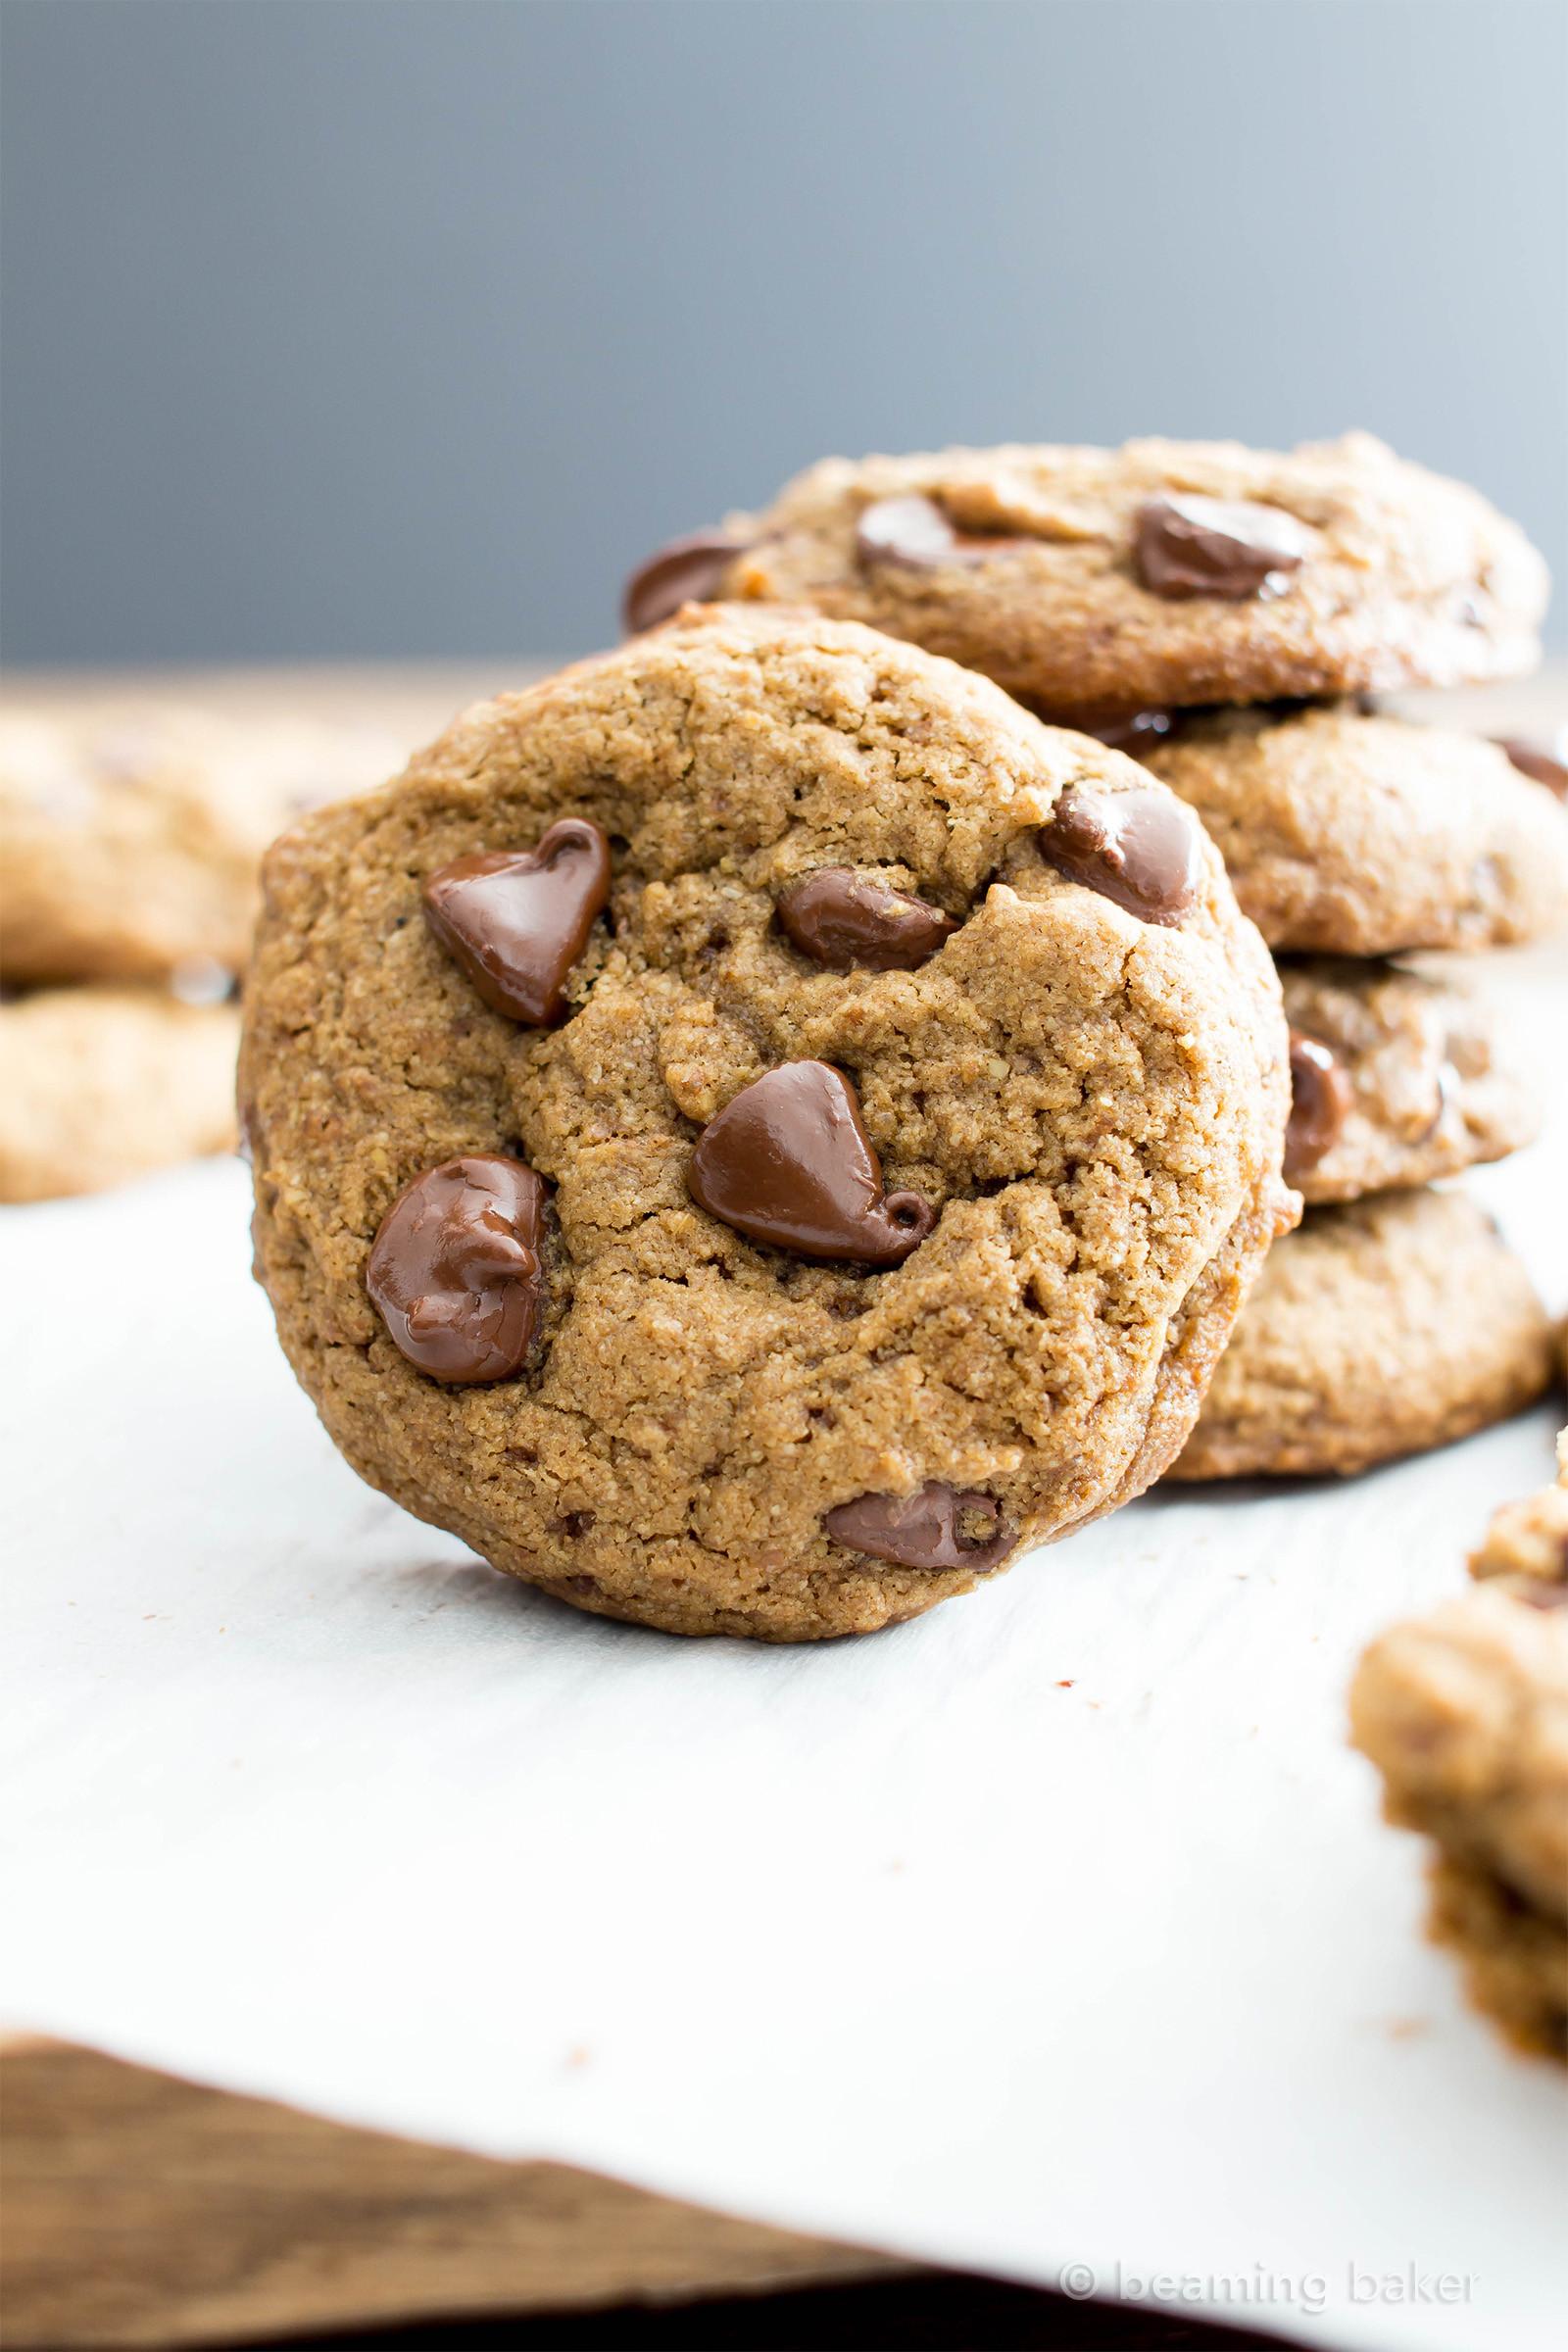 Vegan Gluten Free Chocolate Chip Cookies  Vegan Chocolate Chip Cookies Recipe Gluten Free Dairy